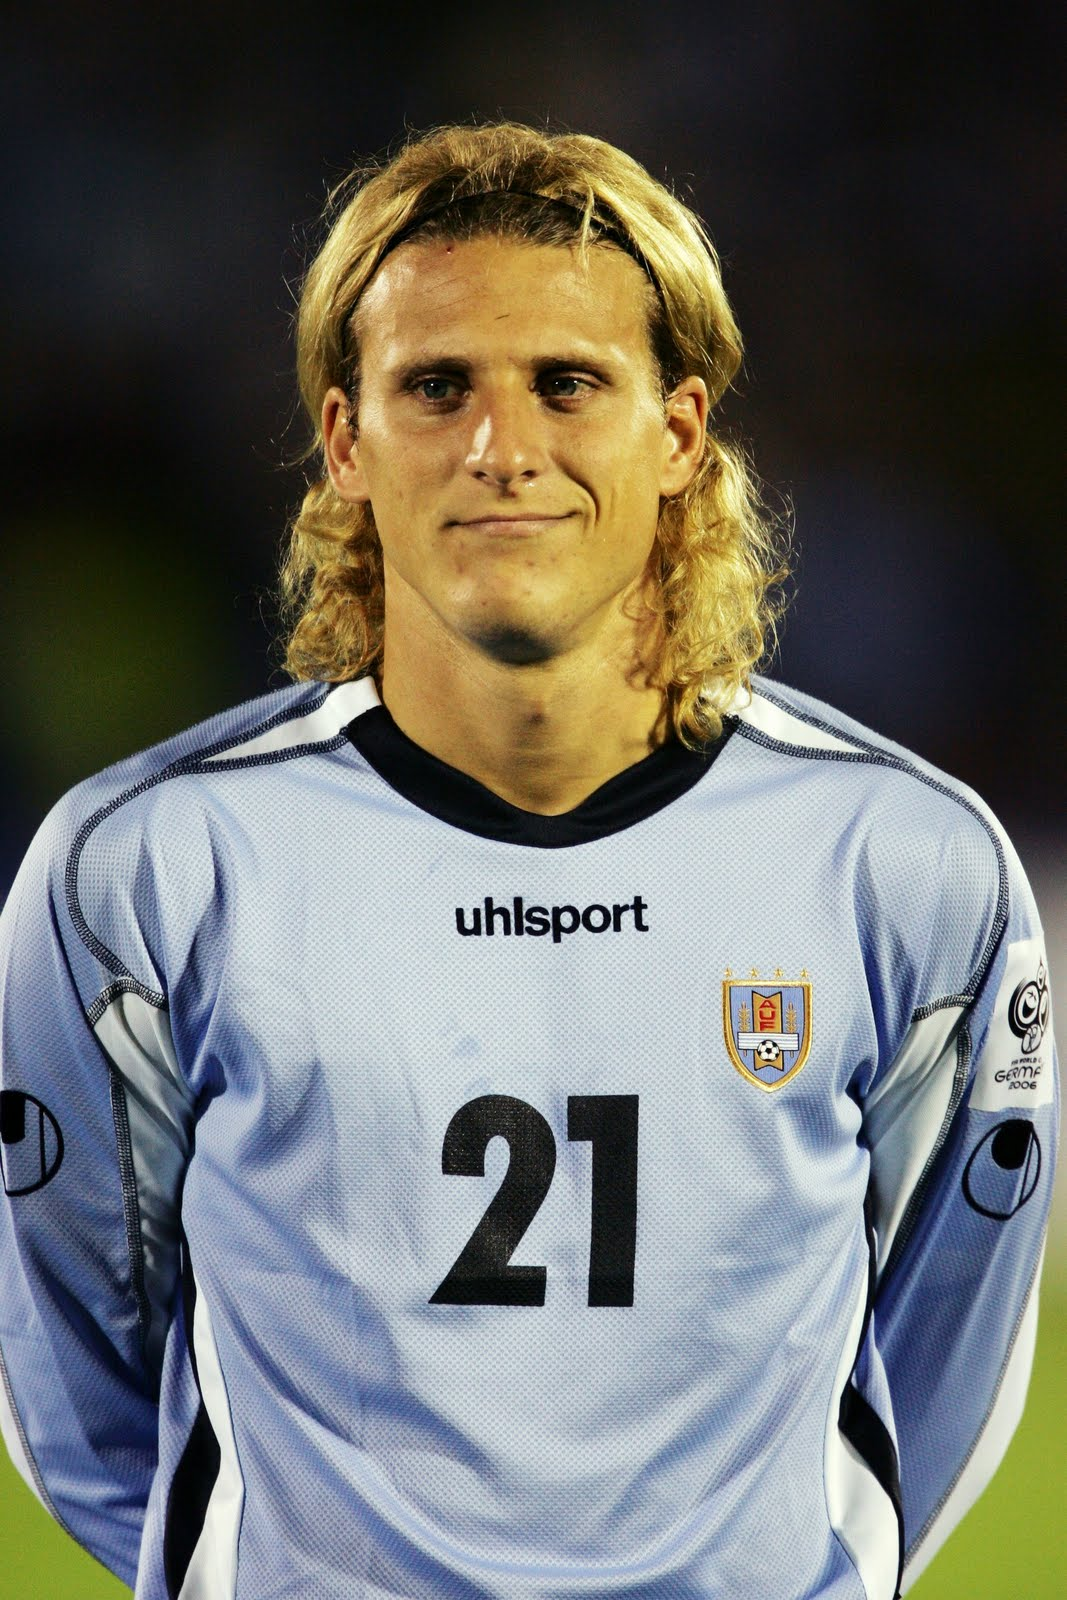 Diego Player